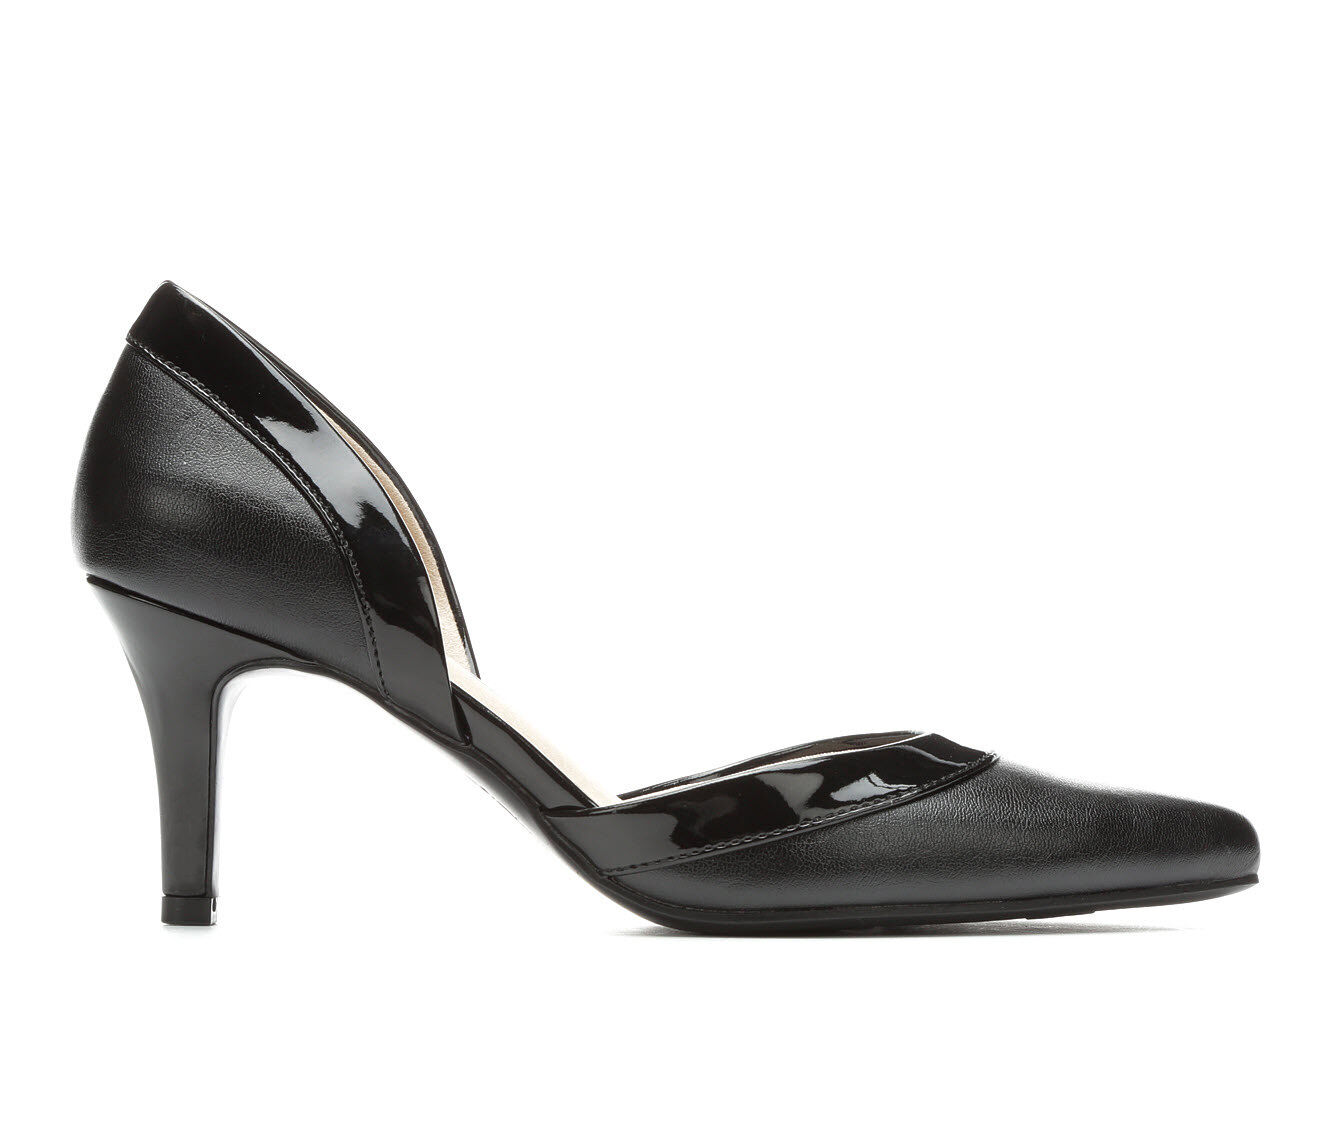 latest style Women's LifeStride Saldana Pumps Black Patent